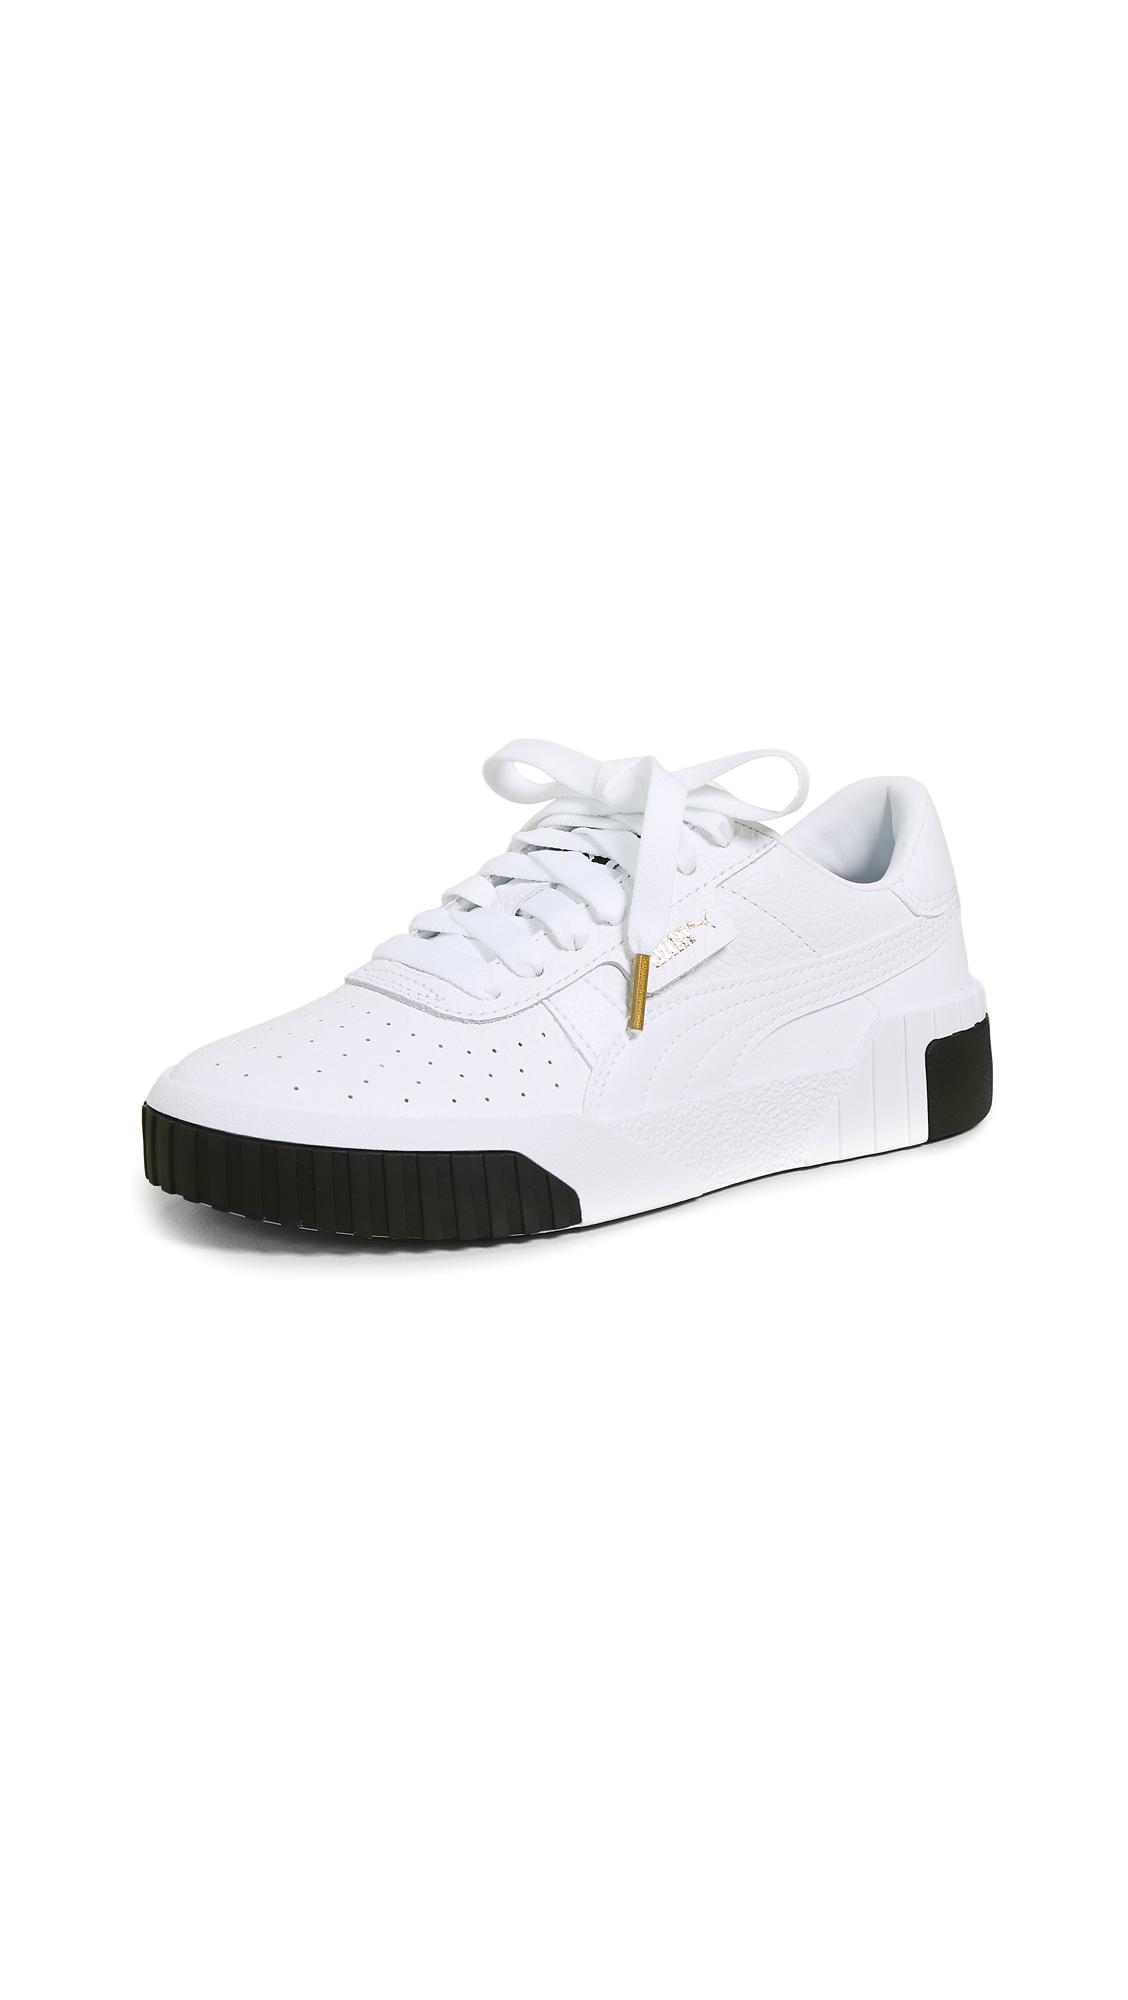 PUMA Cali Fashion Sneakers - Puma White/Puma White